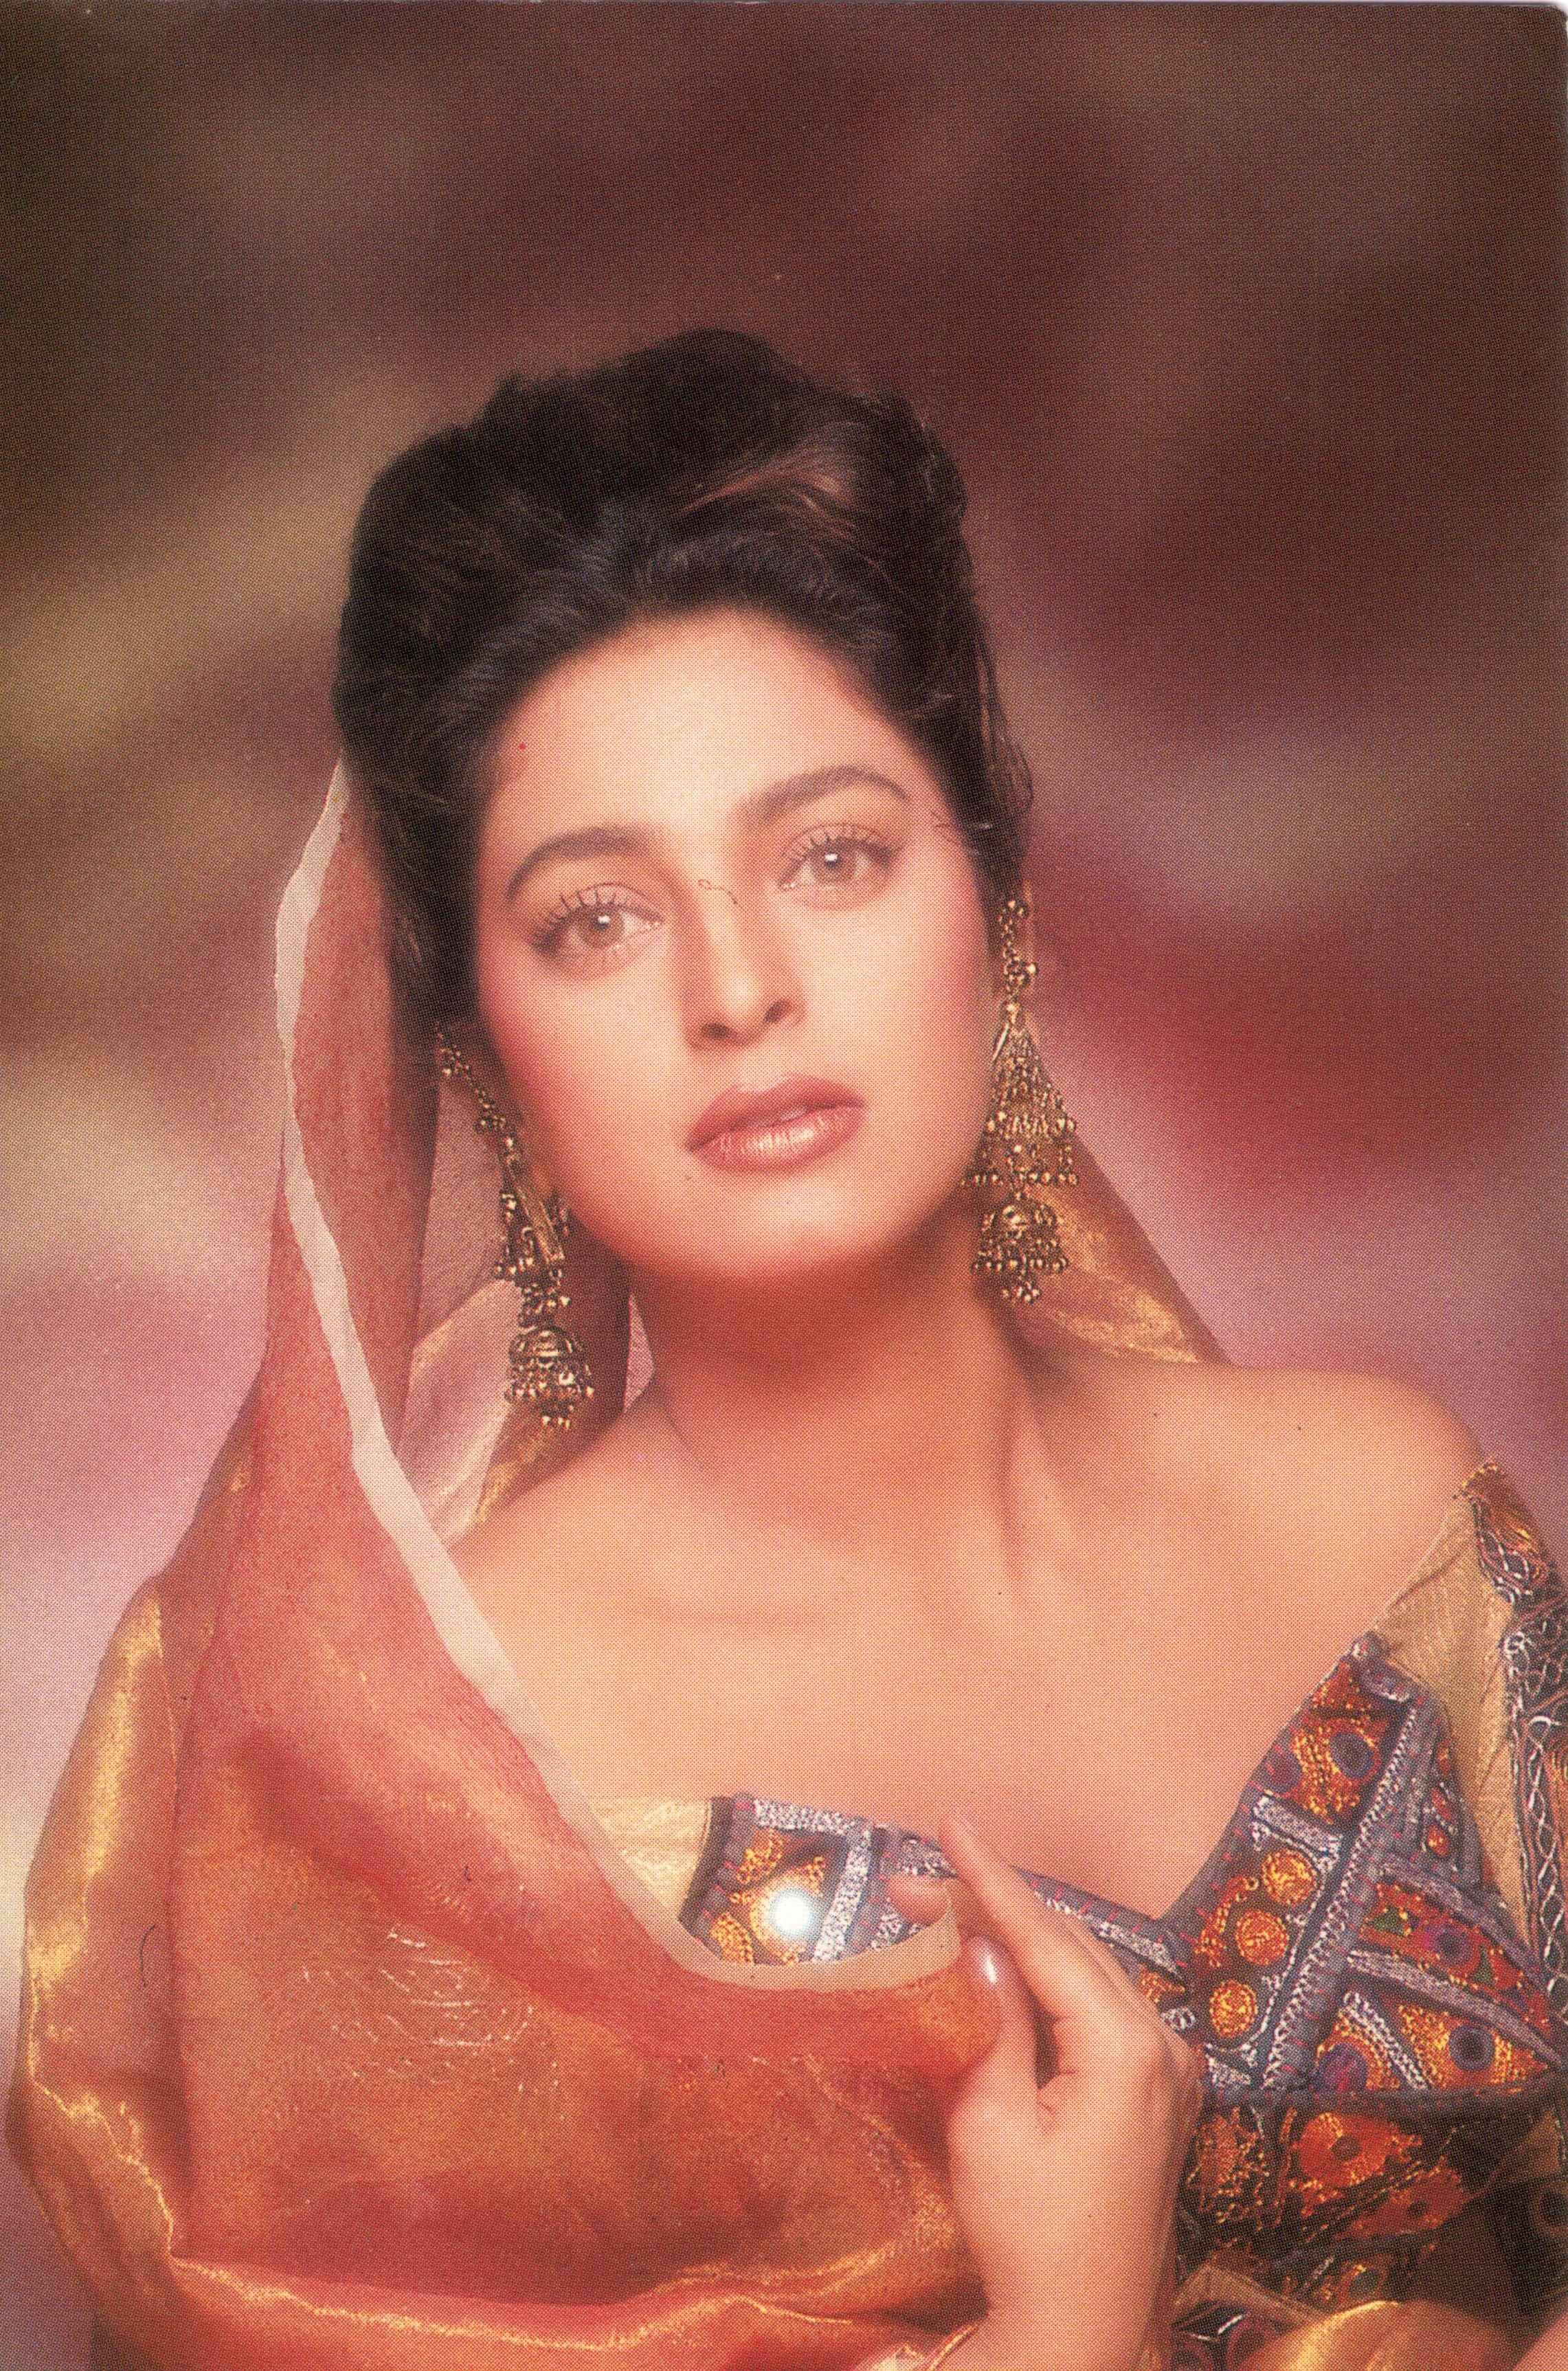 PHOTOS : Celeb spotting: Aishwarya Rai Bachchan, Shah Www juhi chawla photos